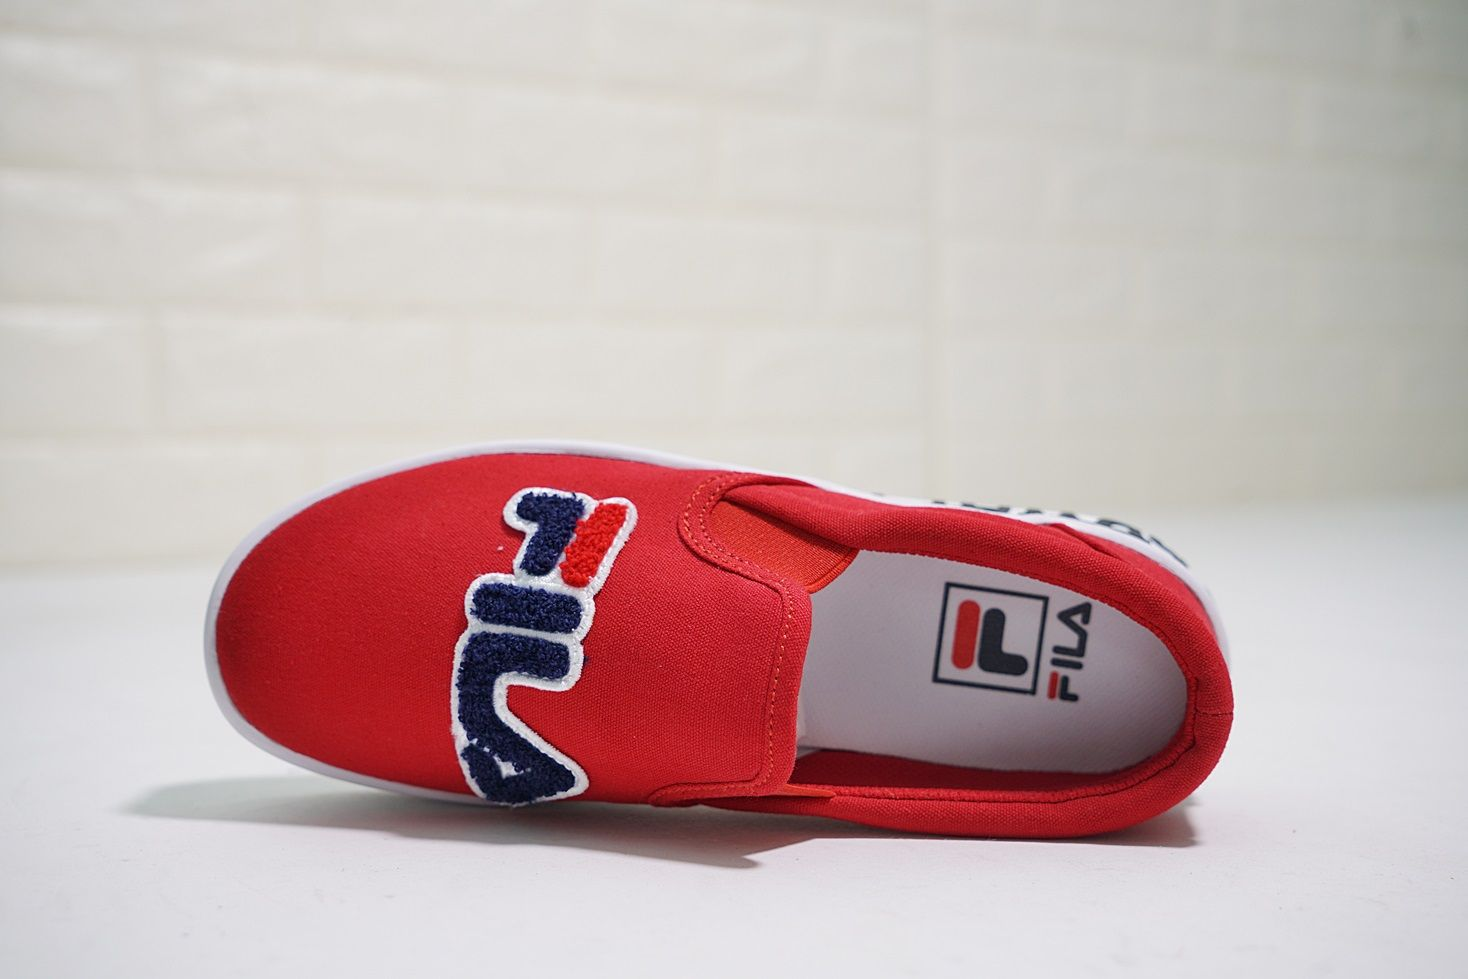 Fila Court Slip On Red dark blue white Women's Canvas Shoes